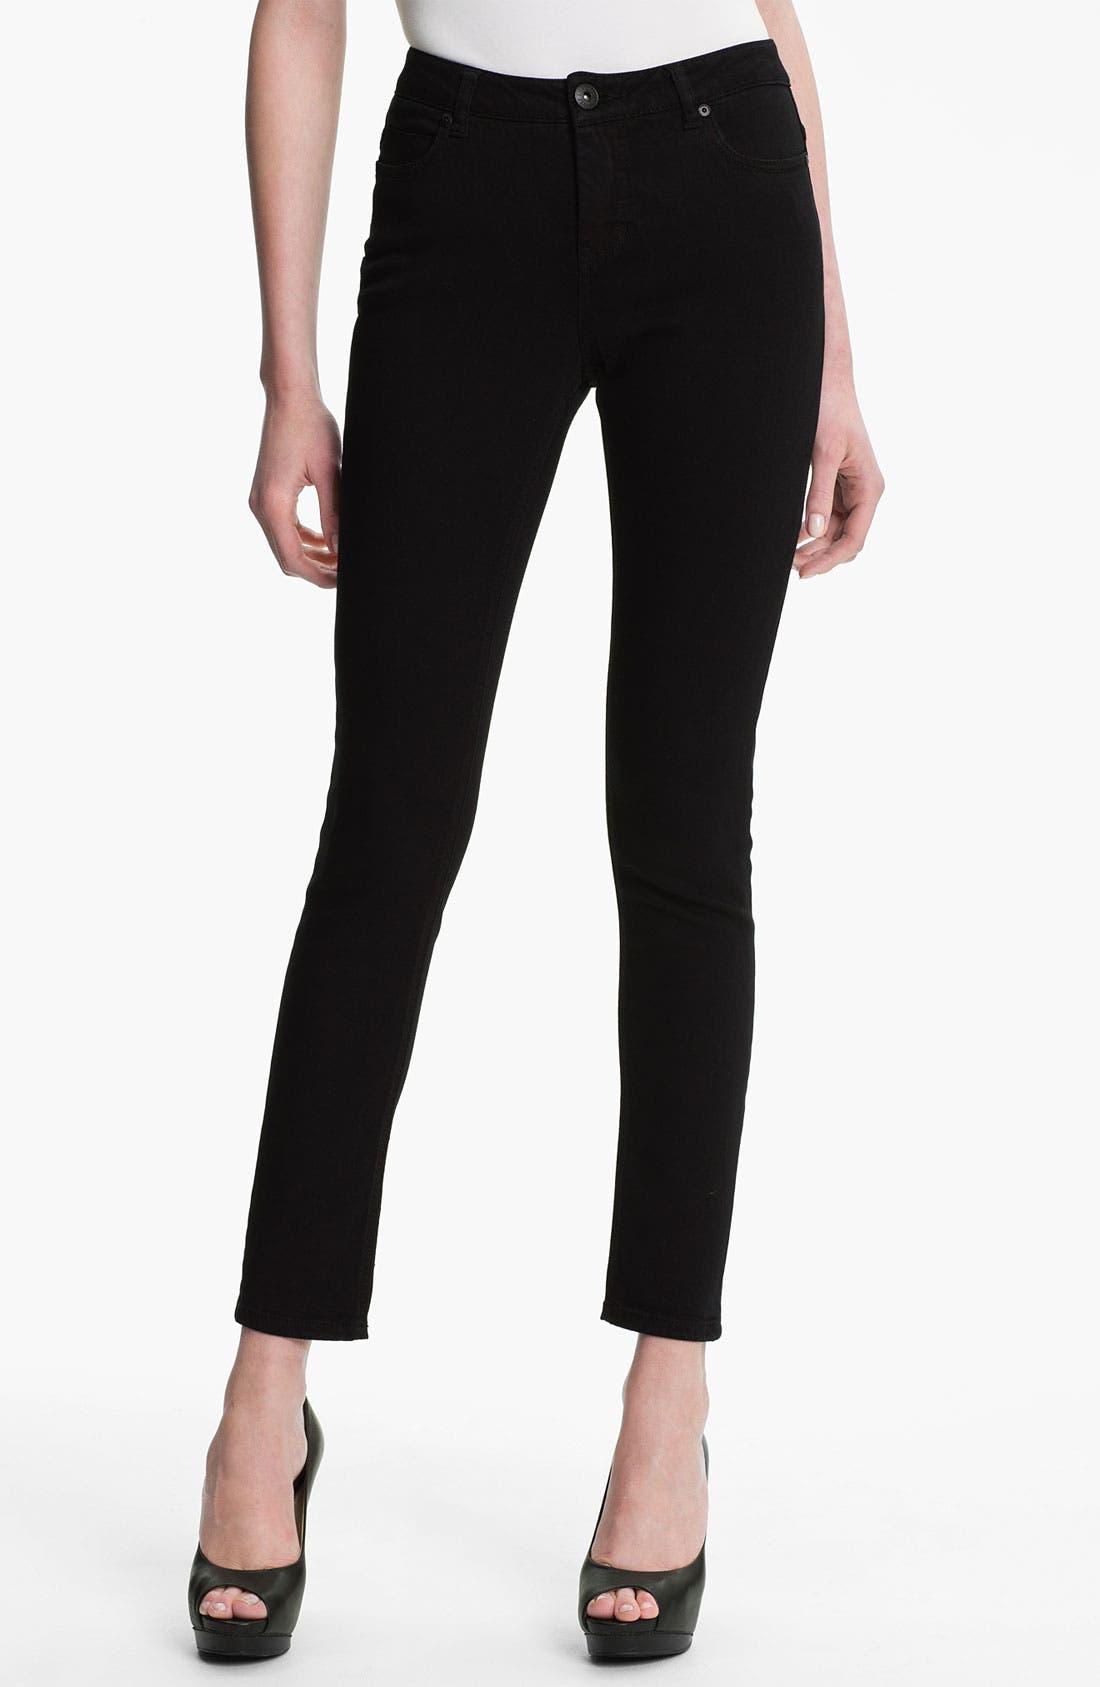 Main Image - Liverpool Jeans Company 'Madonna' Skinny Stretch Jeans